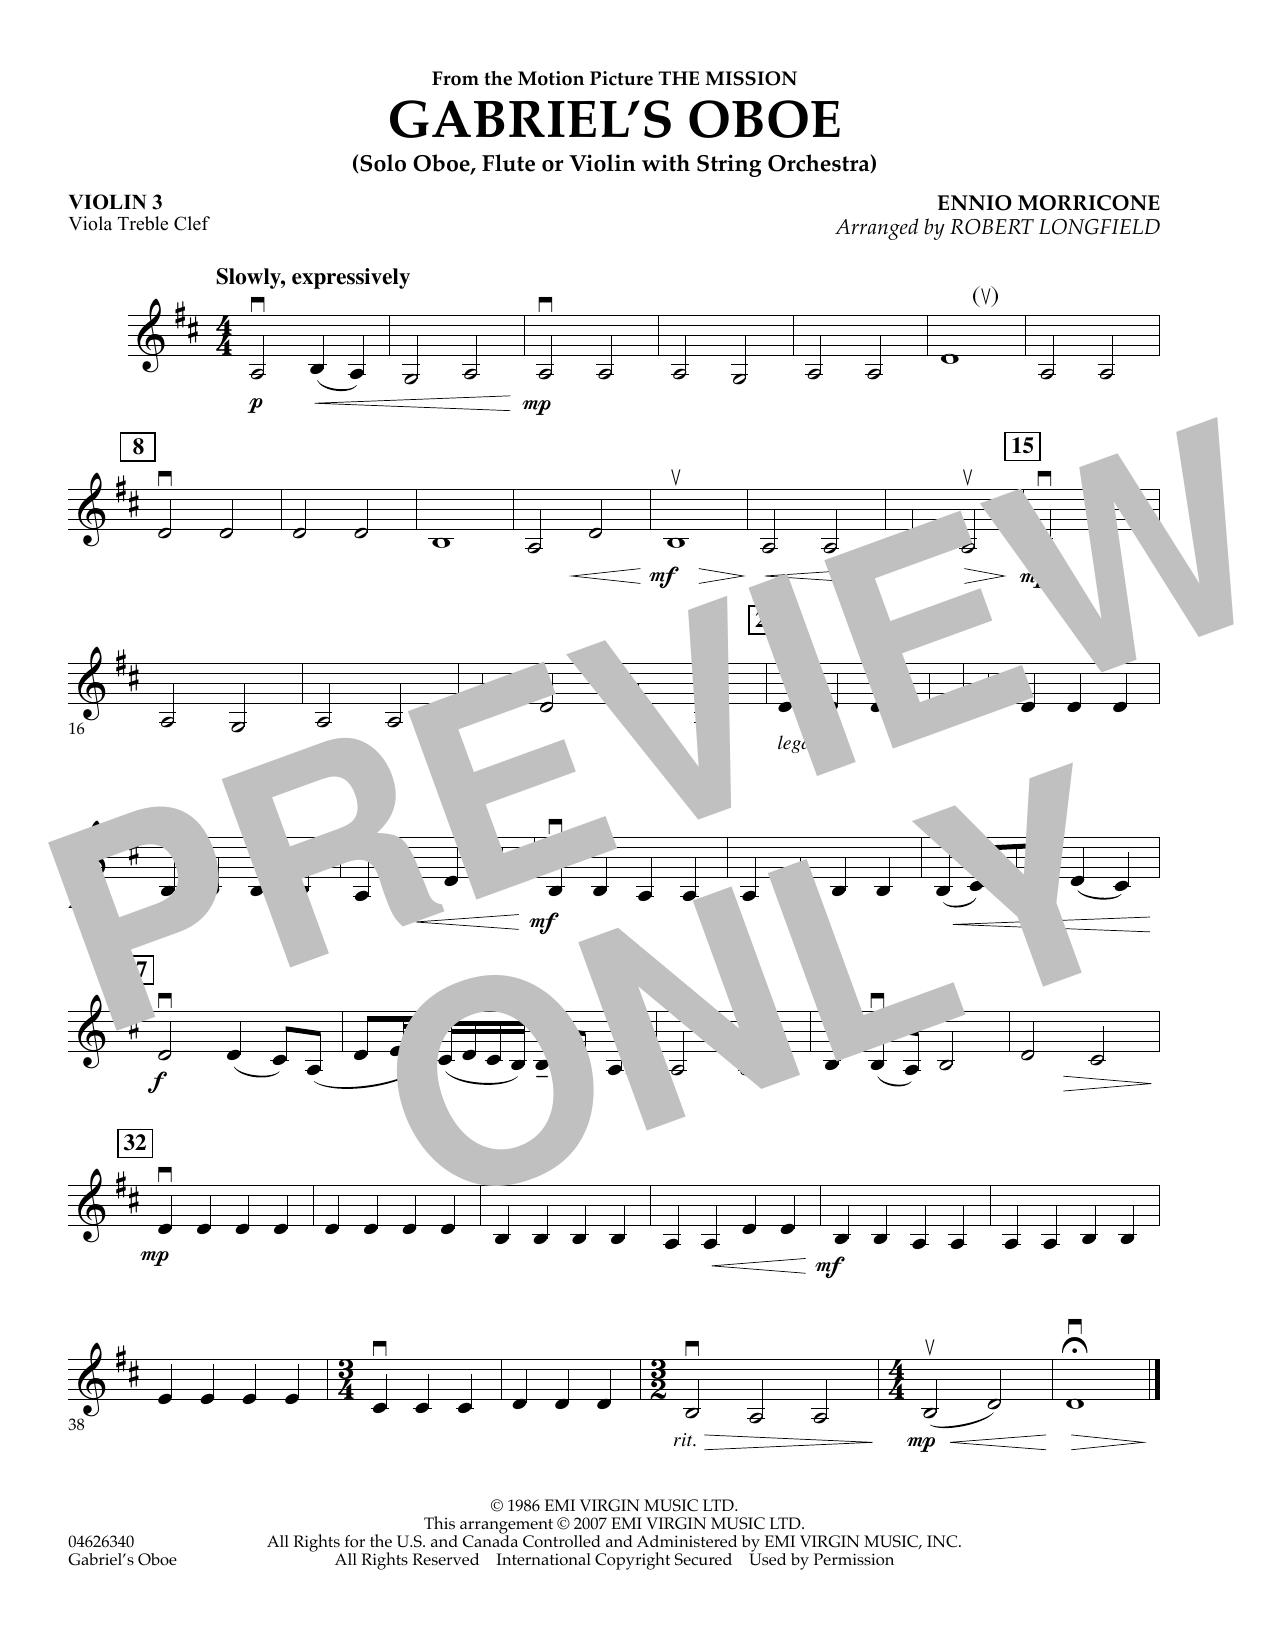 Gabriel's Oboe (from The Mission) - Violin 3 (Viola Treble Clef) (Orchestra)